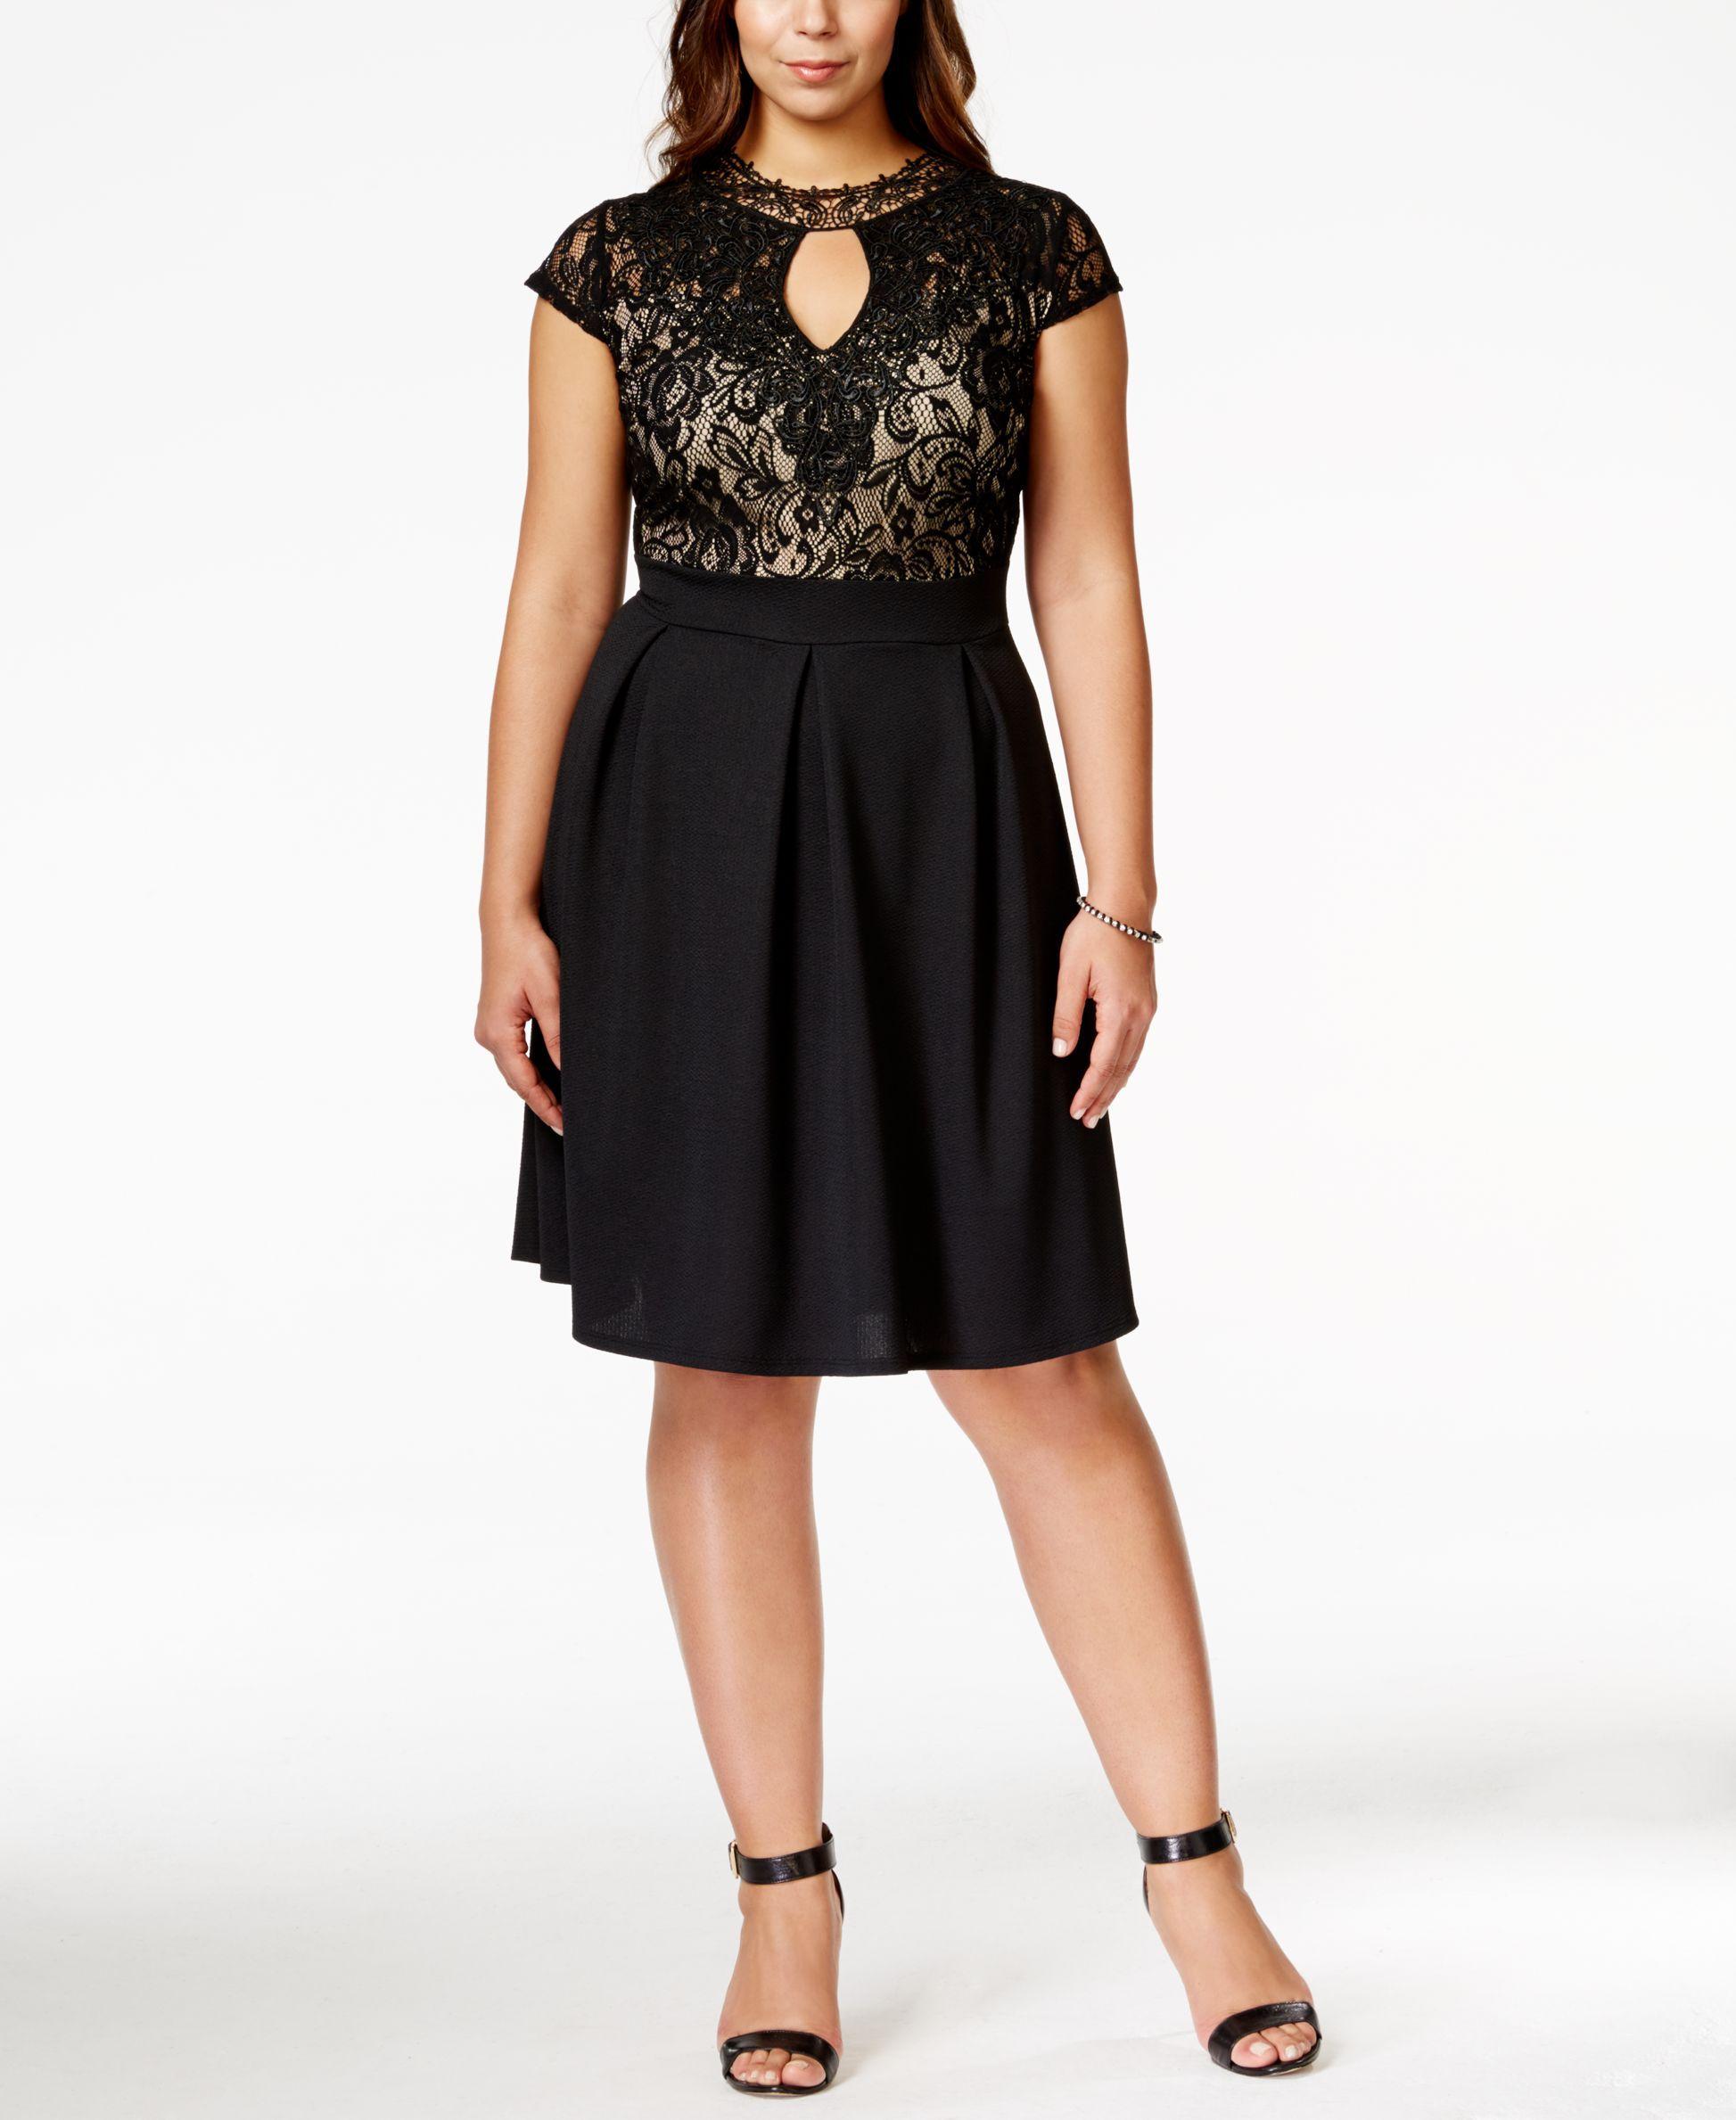 Trixxi plus size shortsleeve lace aline skater dress products